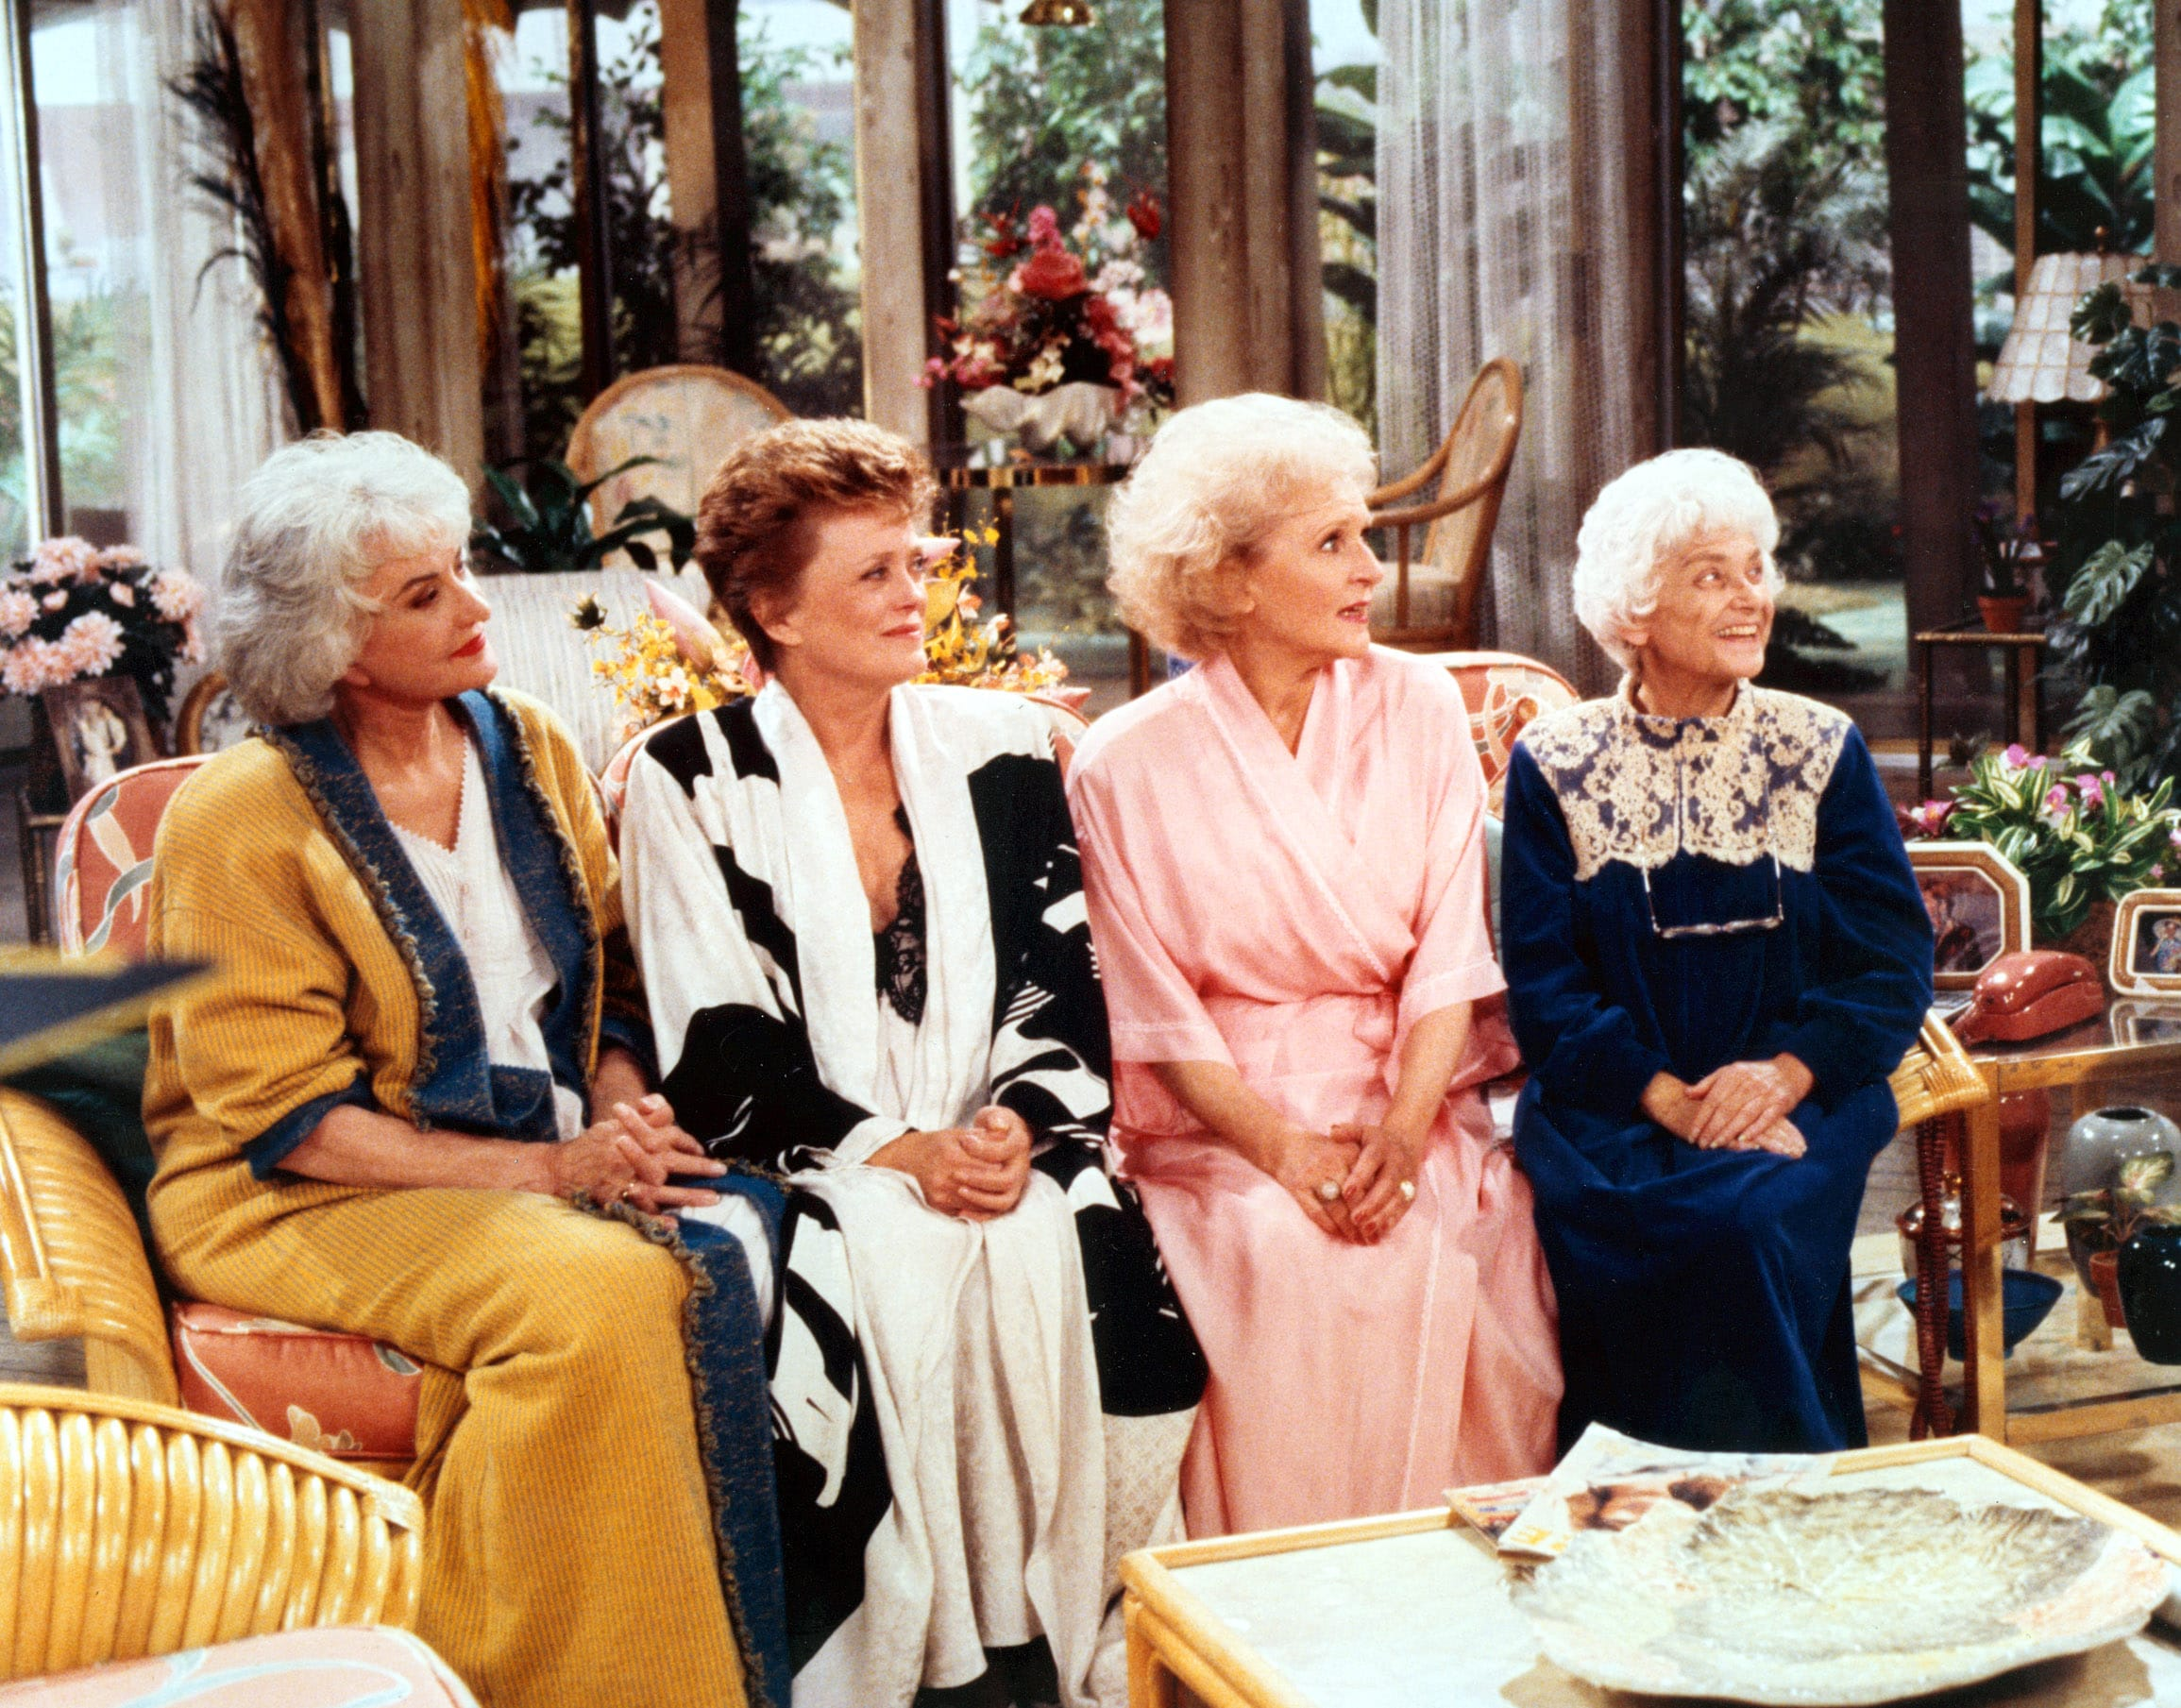 Bea Arthur, Rue McClanahan, Betty White, Estelle Getty